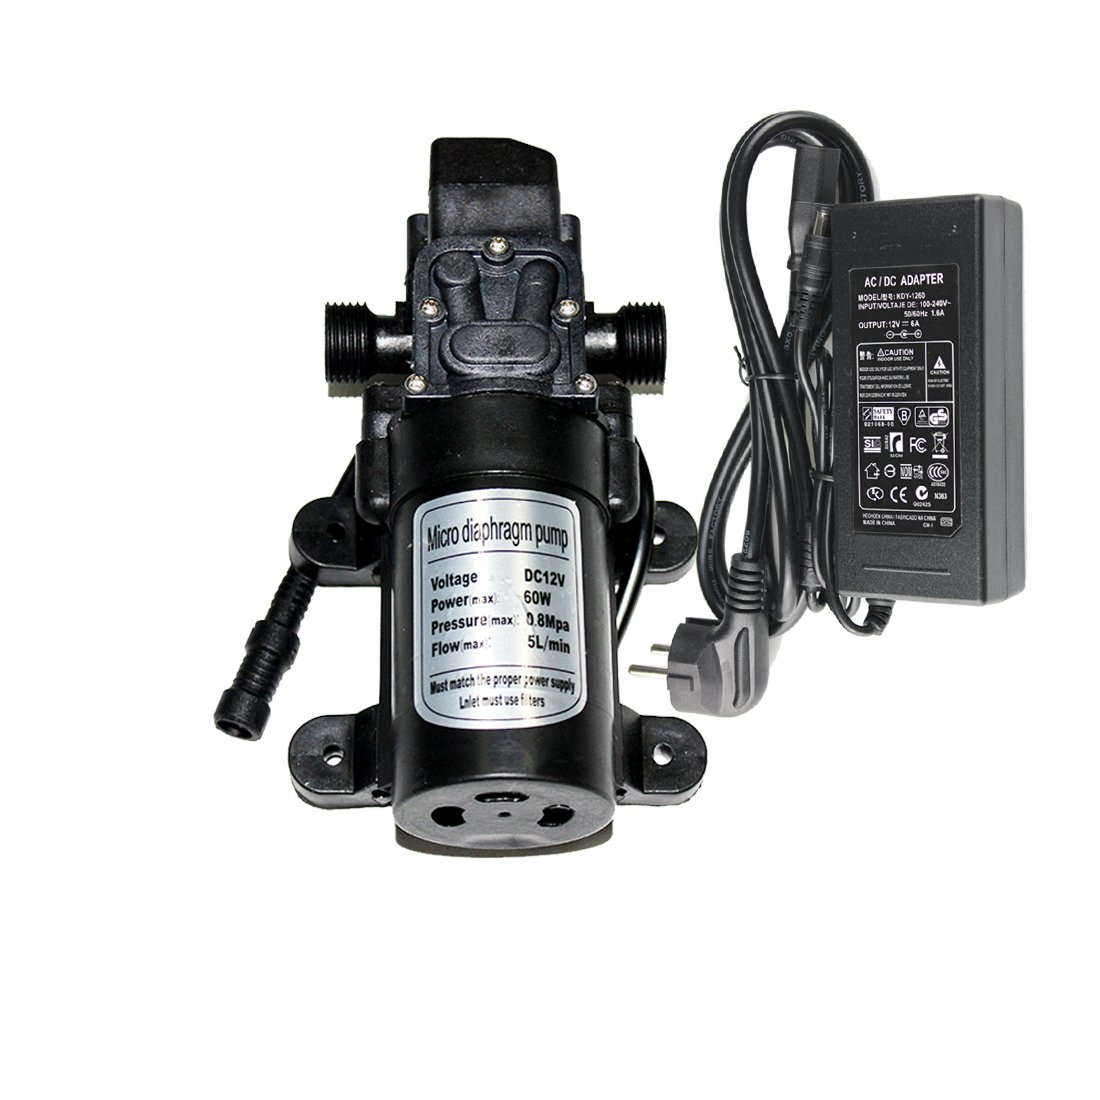 Hylaea 12V 60W 5L/min Self Priming Fine Mist Spray Micro Diaphragm Pump, Fresh Water Pressure Diaphragm Pump, Hose Clamps Self Priming Sprayer Pump, Industrial Pump with Power Supply